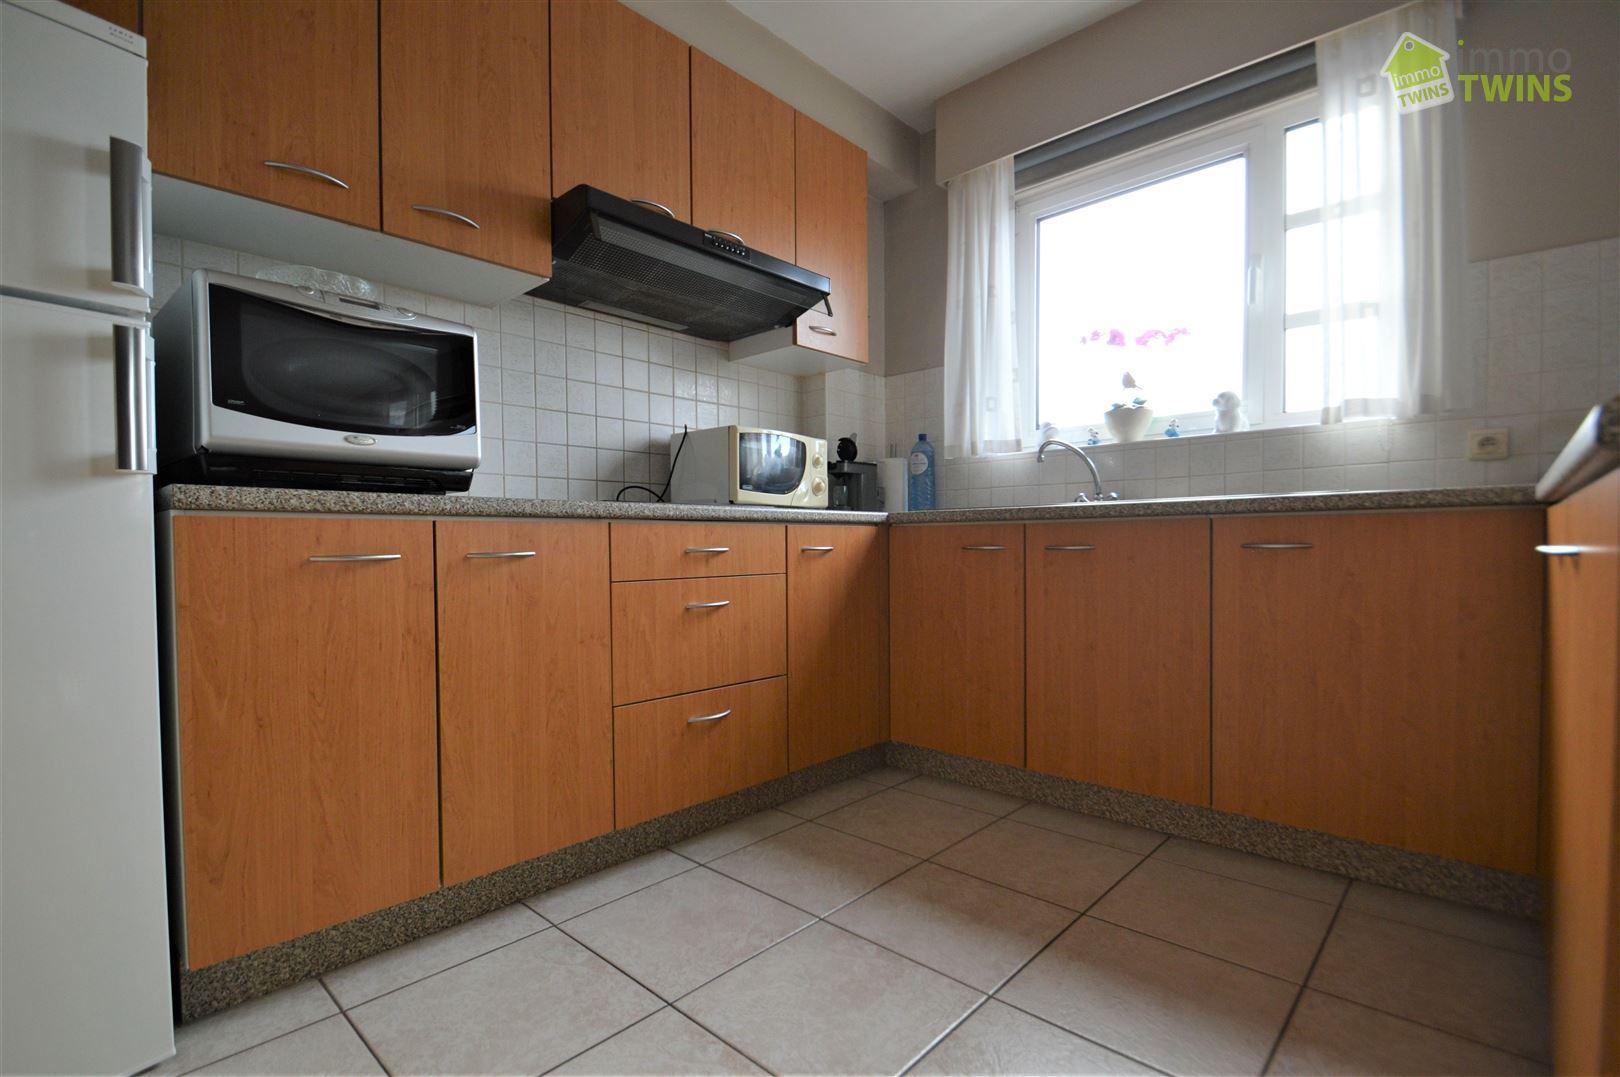 Foto 4 : Appartement te 9200 BAASRODE (België) - Prijs € 630